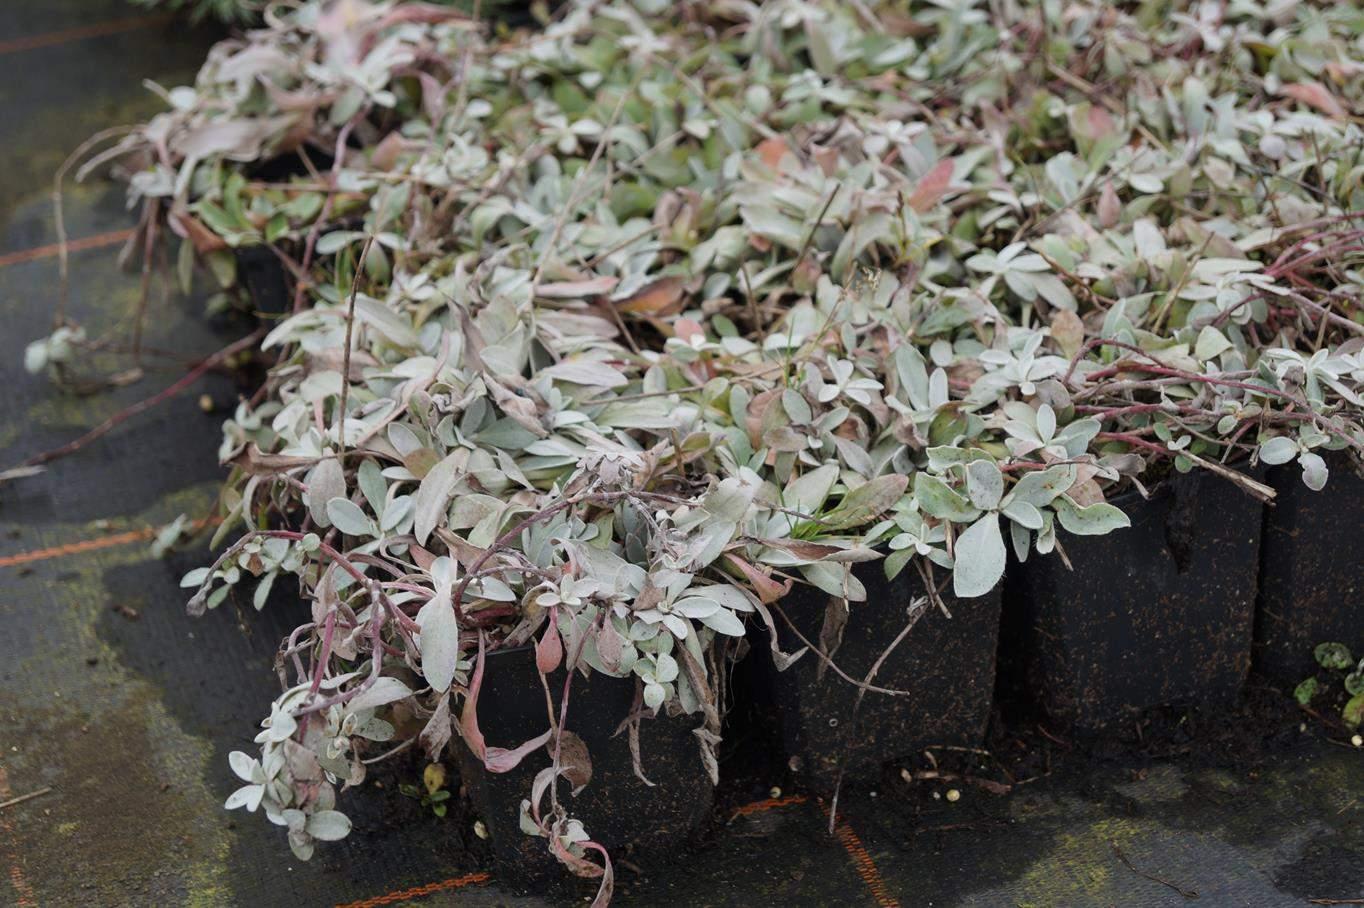 silbrigblattriges garten habichtskraut hieracium pilosella hieracium pilosella niveum7t2YBALTemI8G